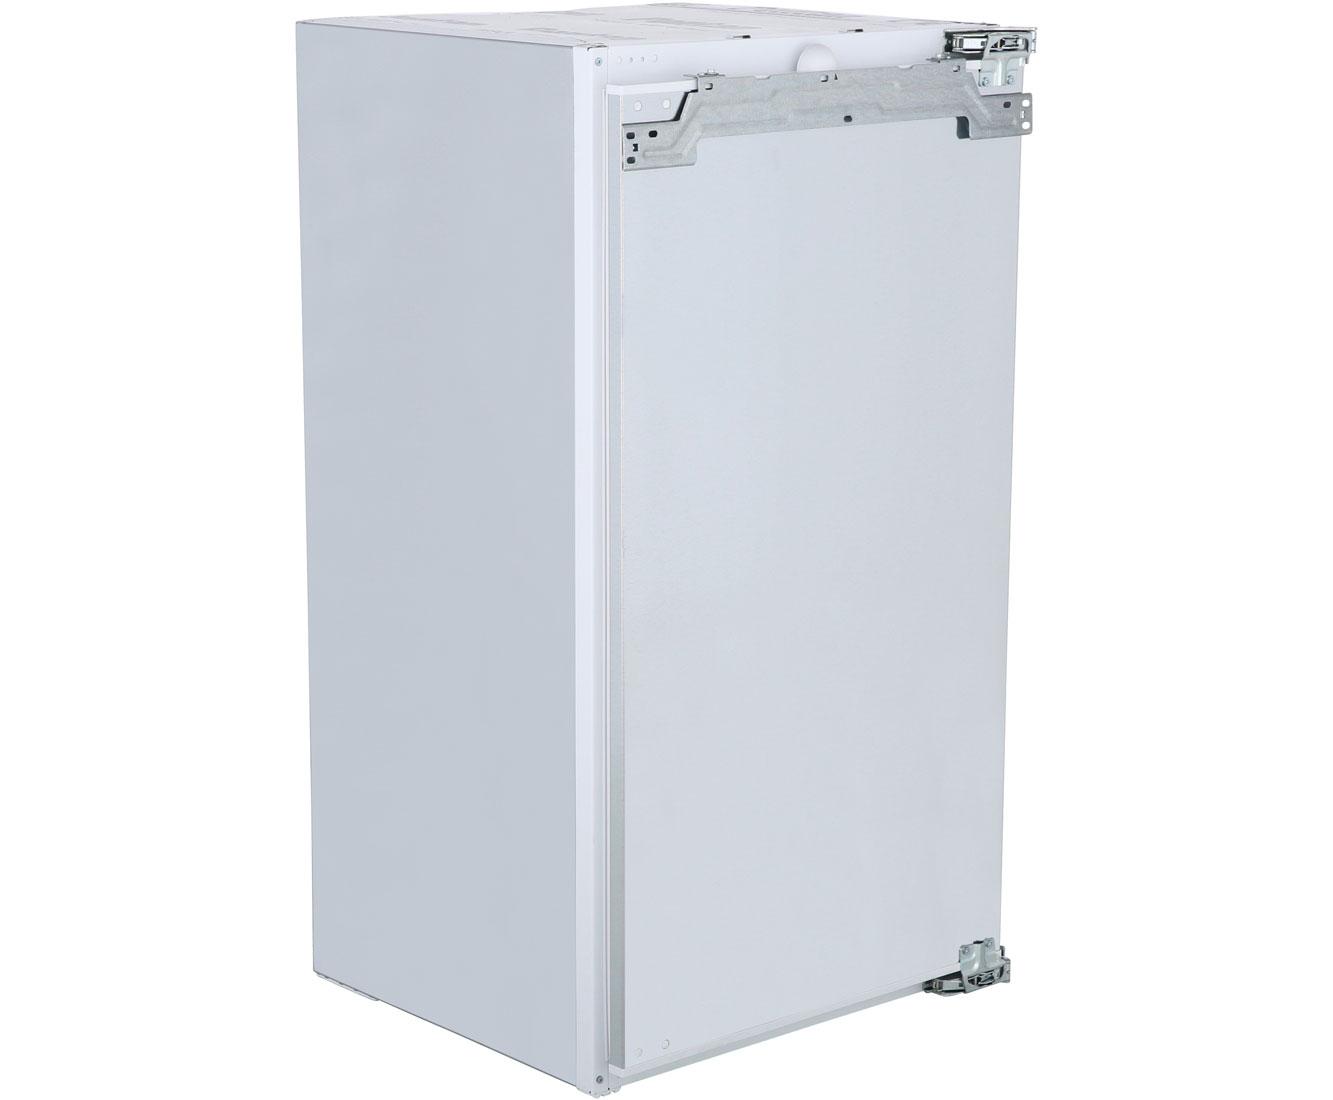 Bomann Kühlschrank Reinigen : Bomann kühlschrank reinigen kühlschrank oder gefriergerät defekt